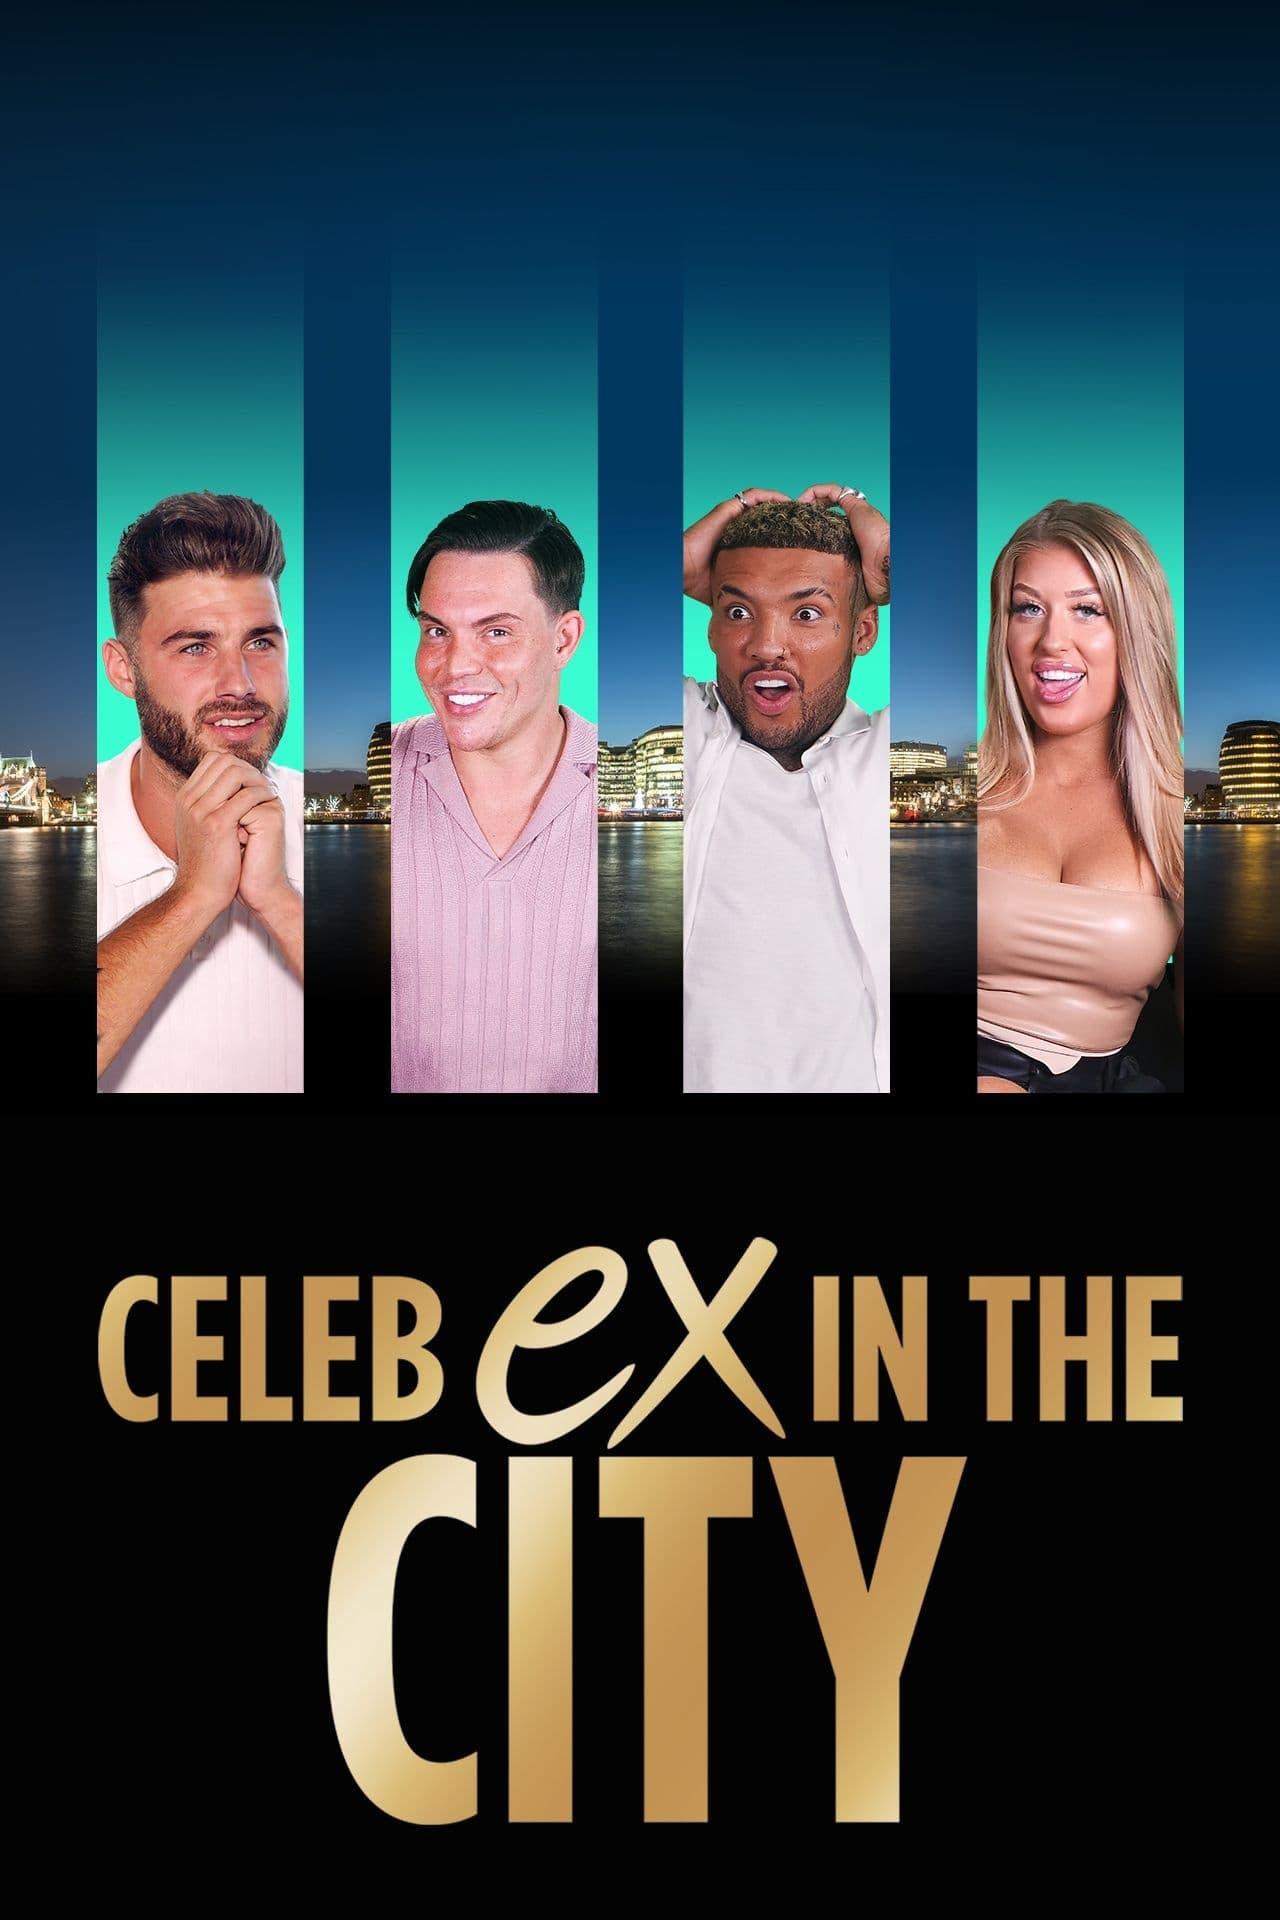 Celeb Ex in the City